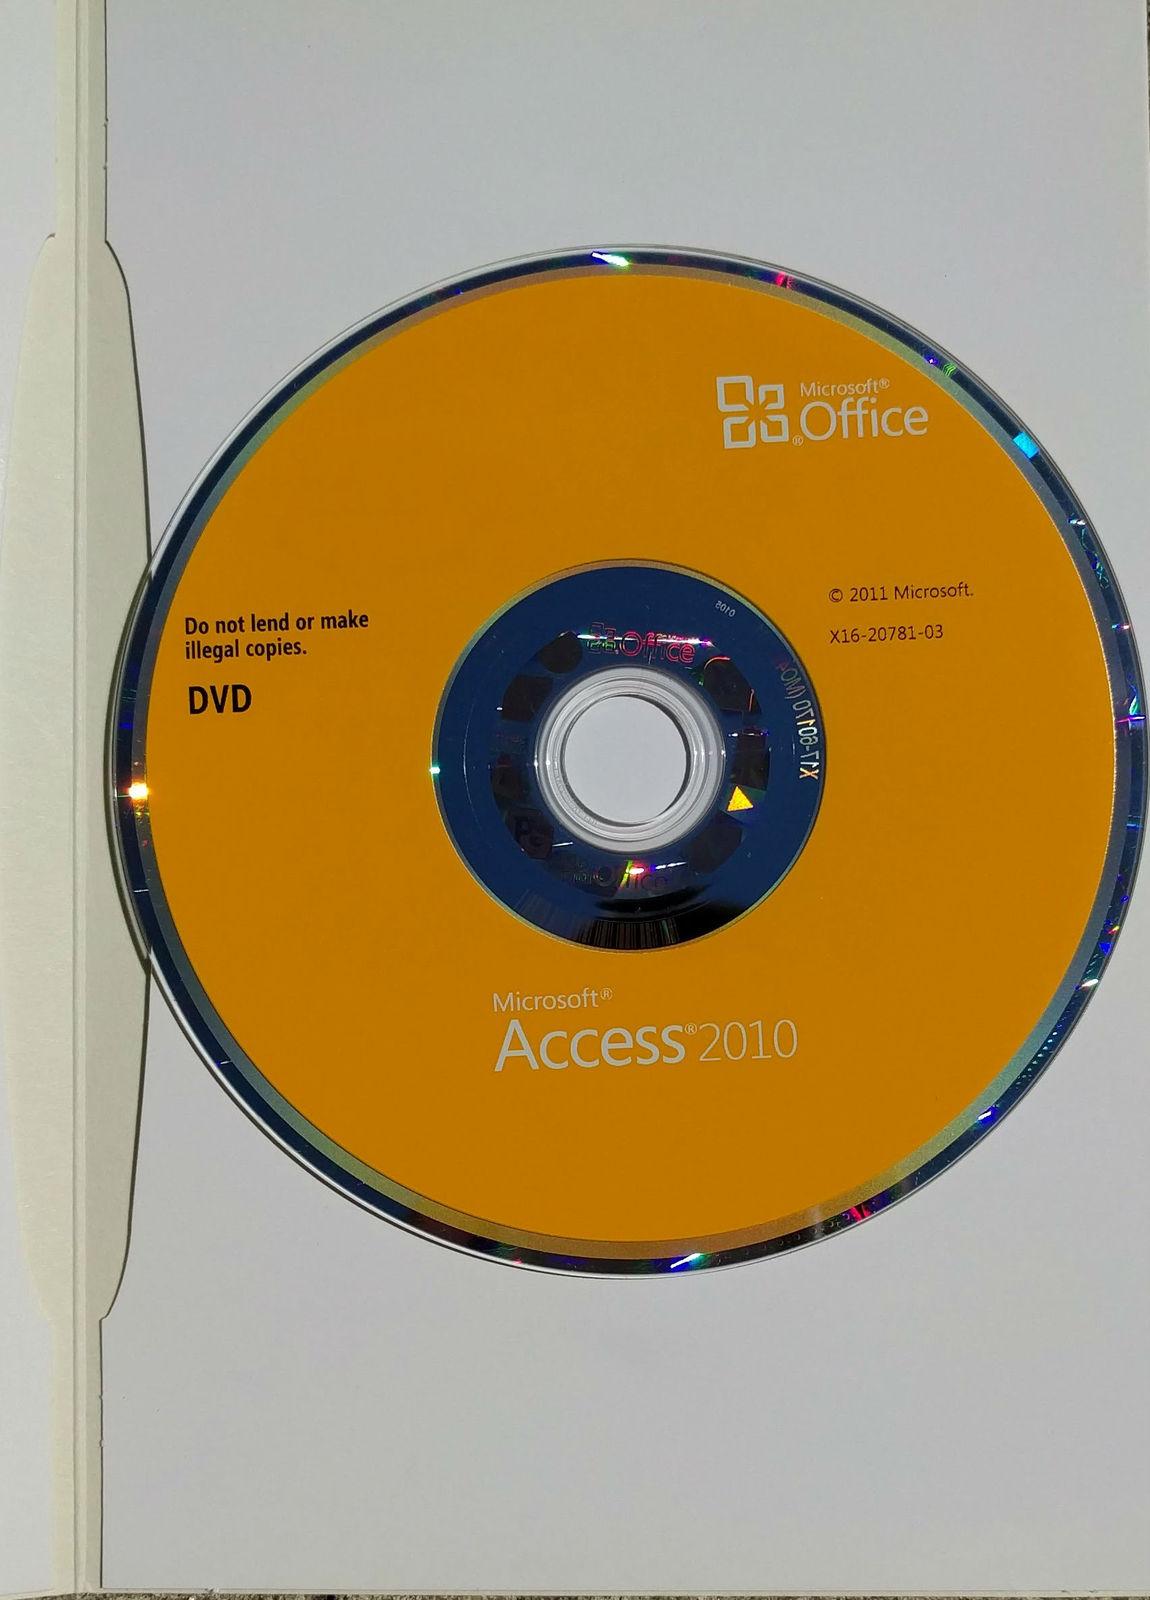 microsoft access 2010 32 bit